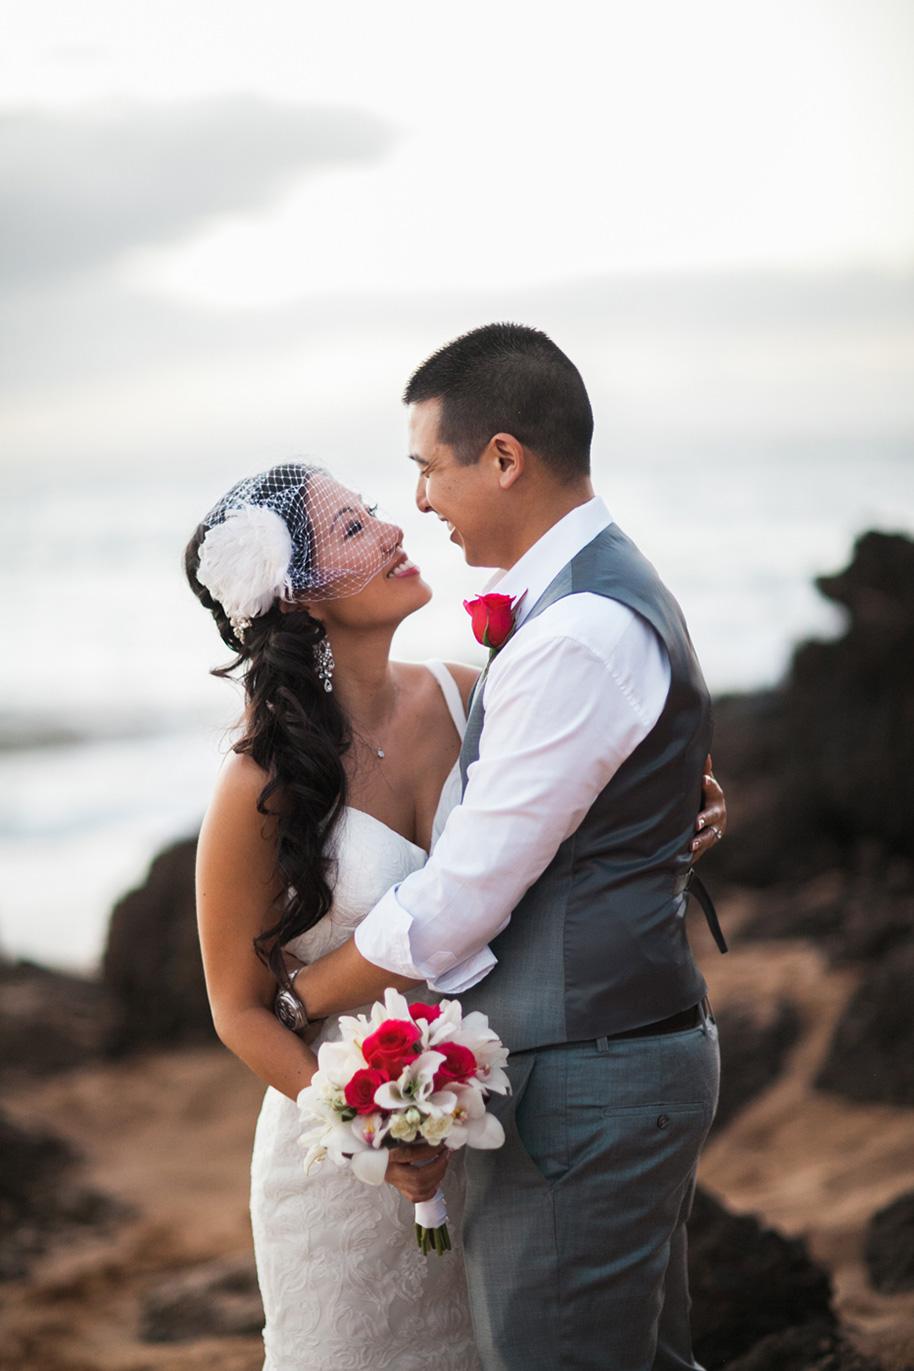 Maui-Beach-Wedding-041216-27